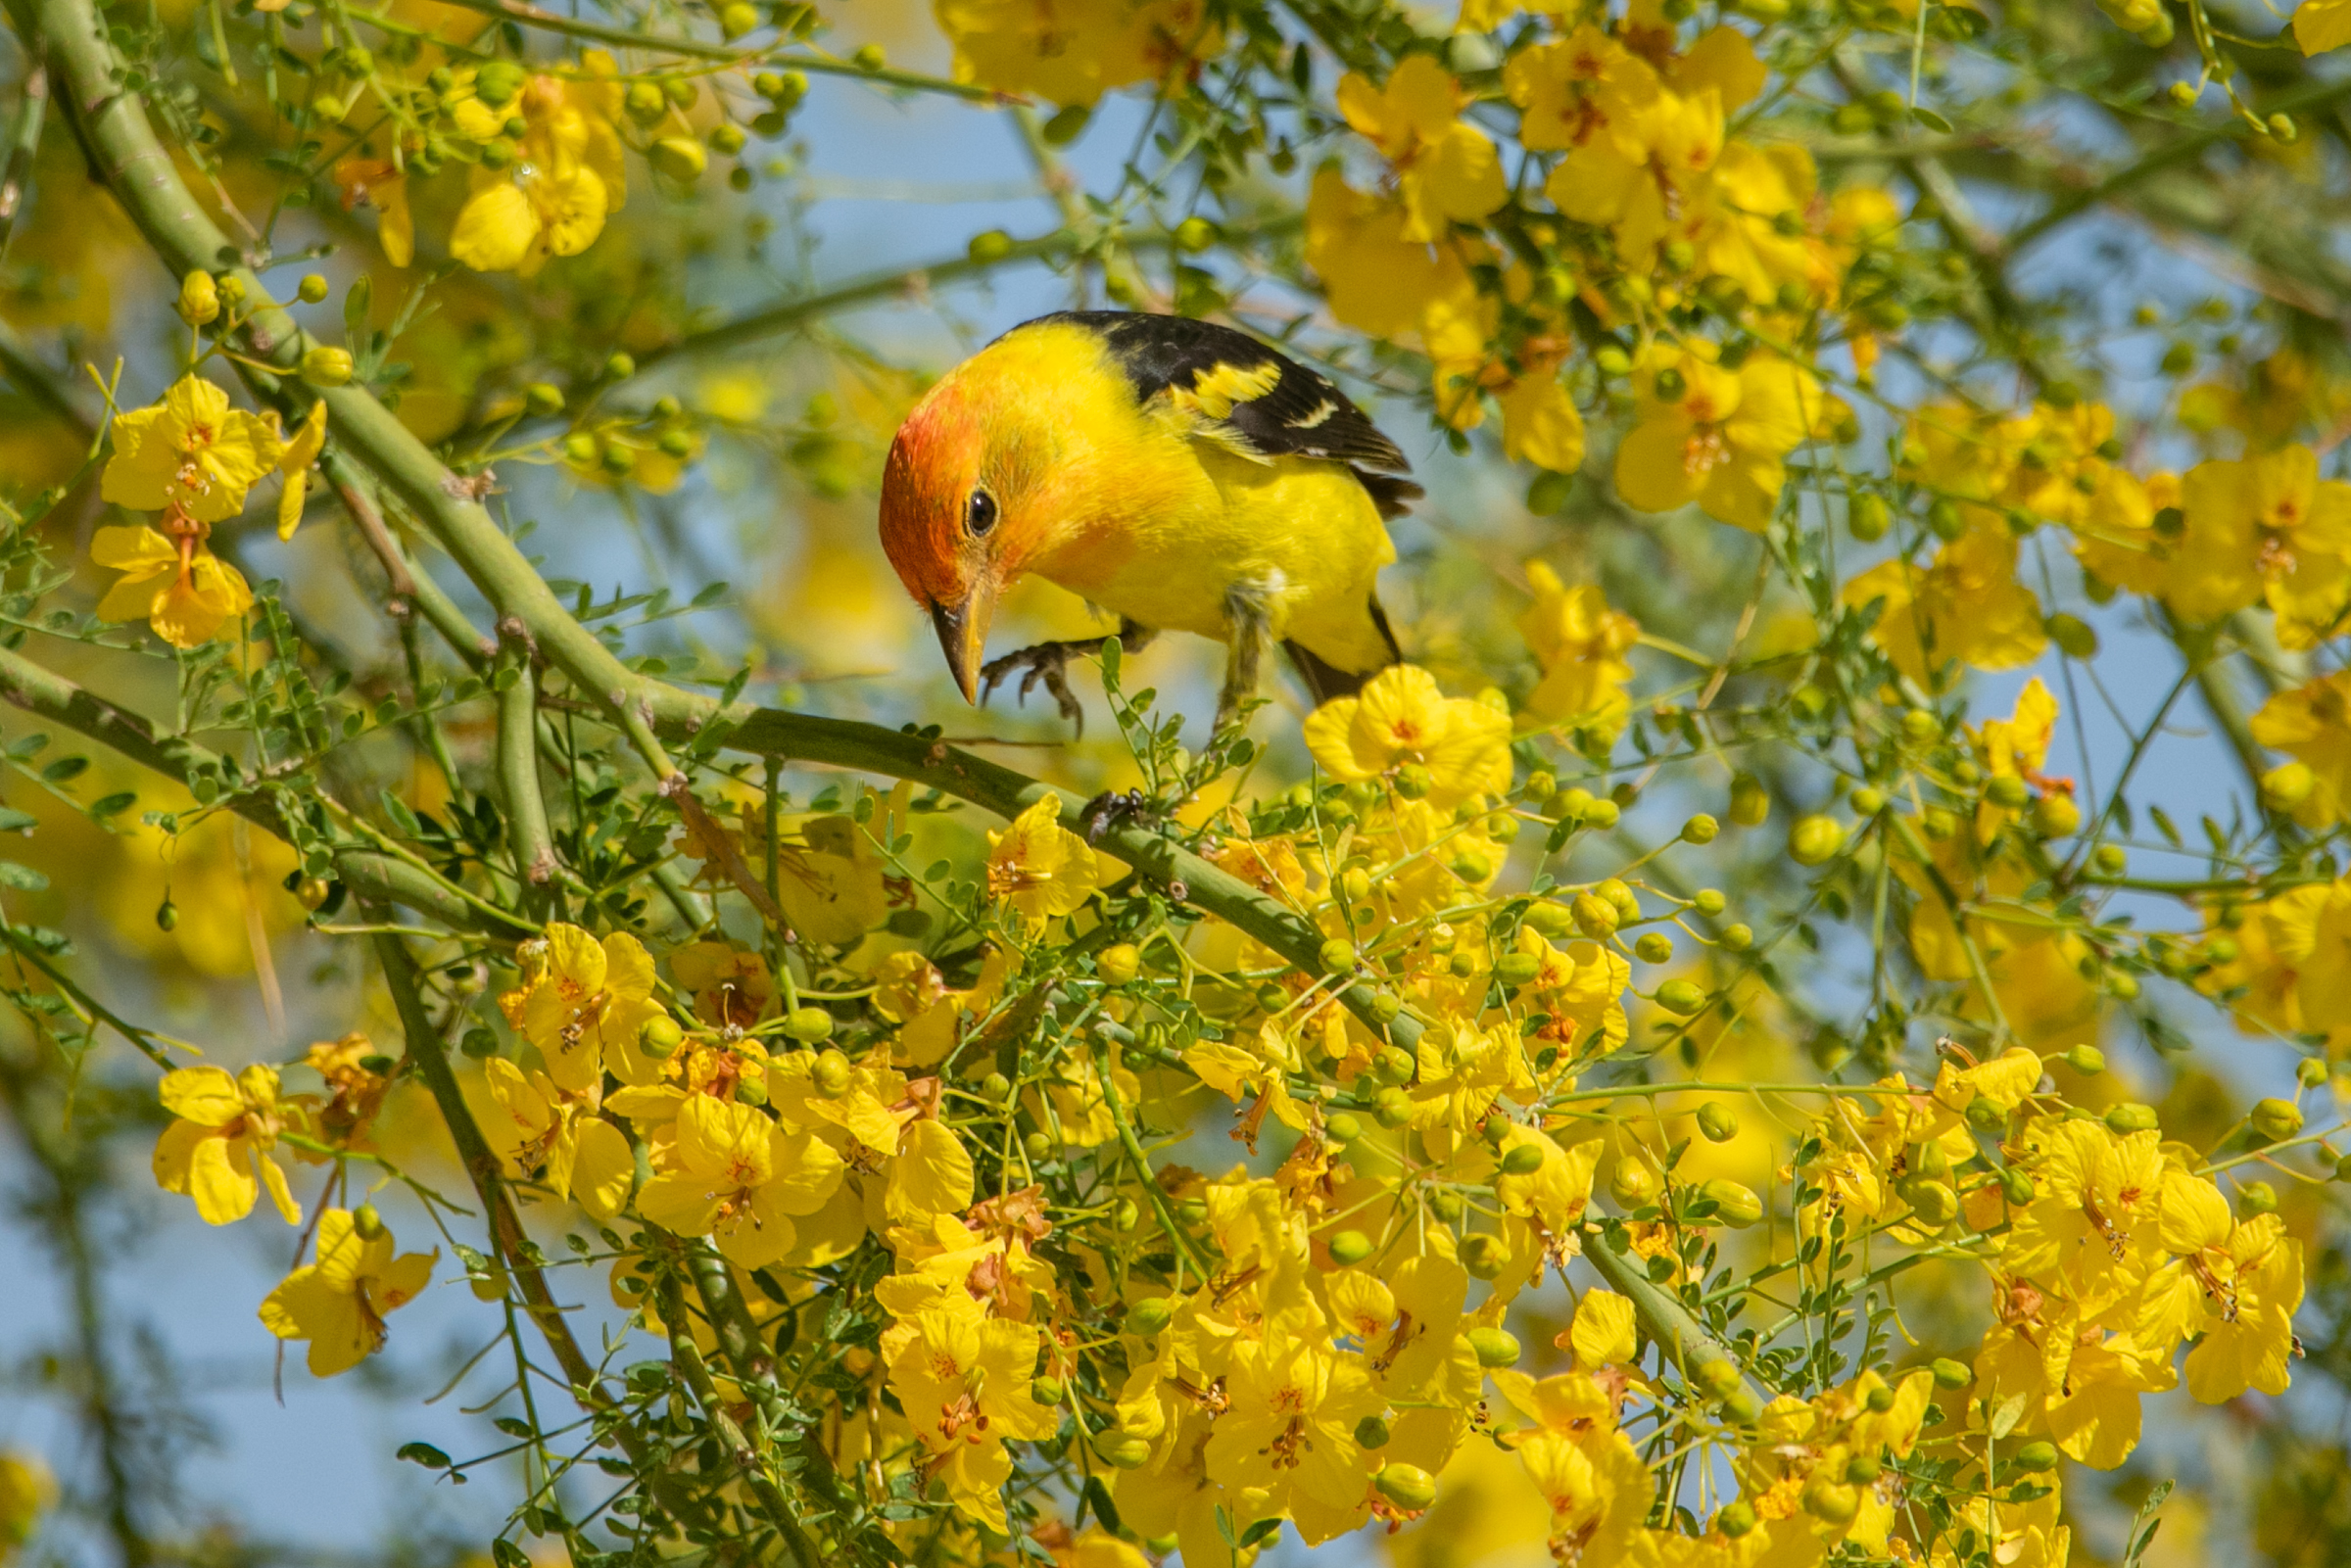 Western Tanager. Photo: Ann Kramer/Audubon Photography Awards